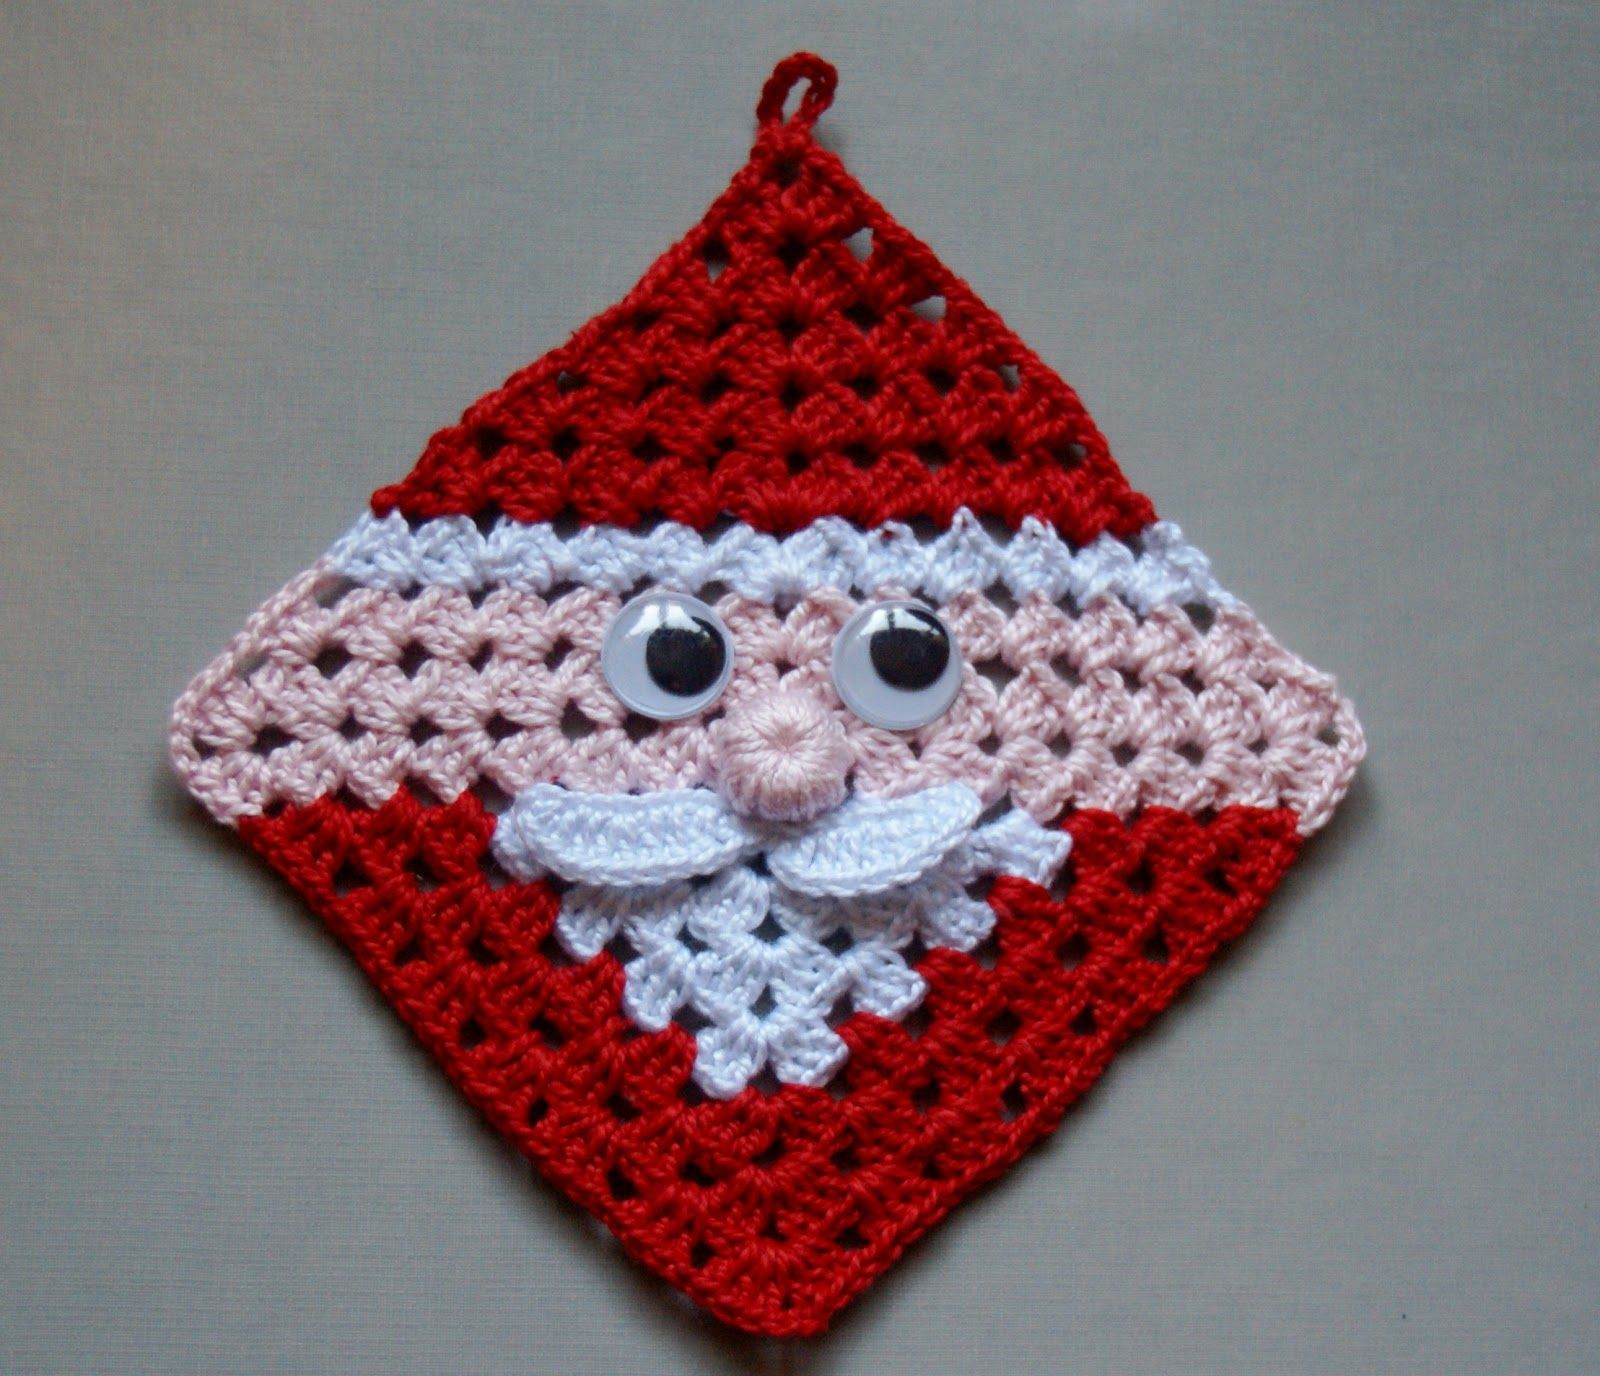 crochet granny square diagram ford consul mk2 wiring free santa claus hot pad